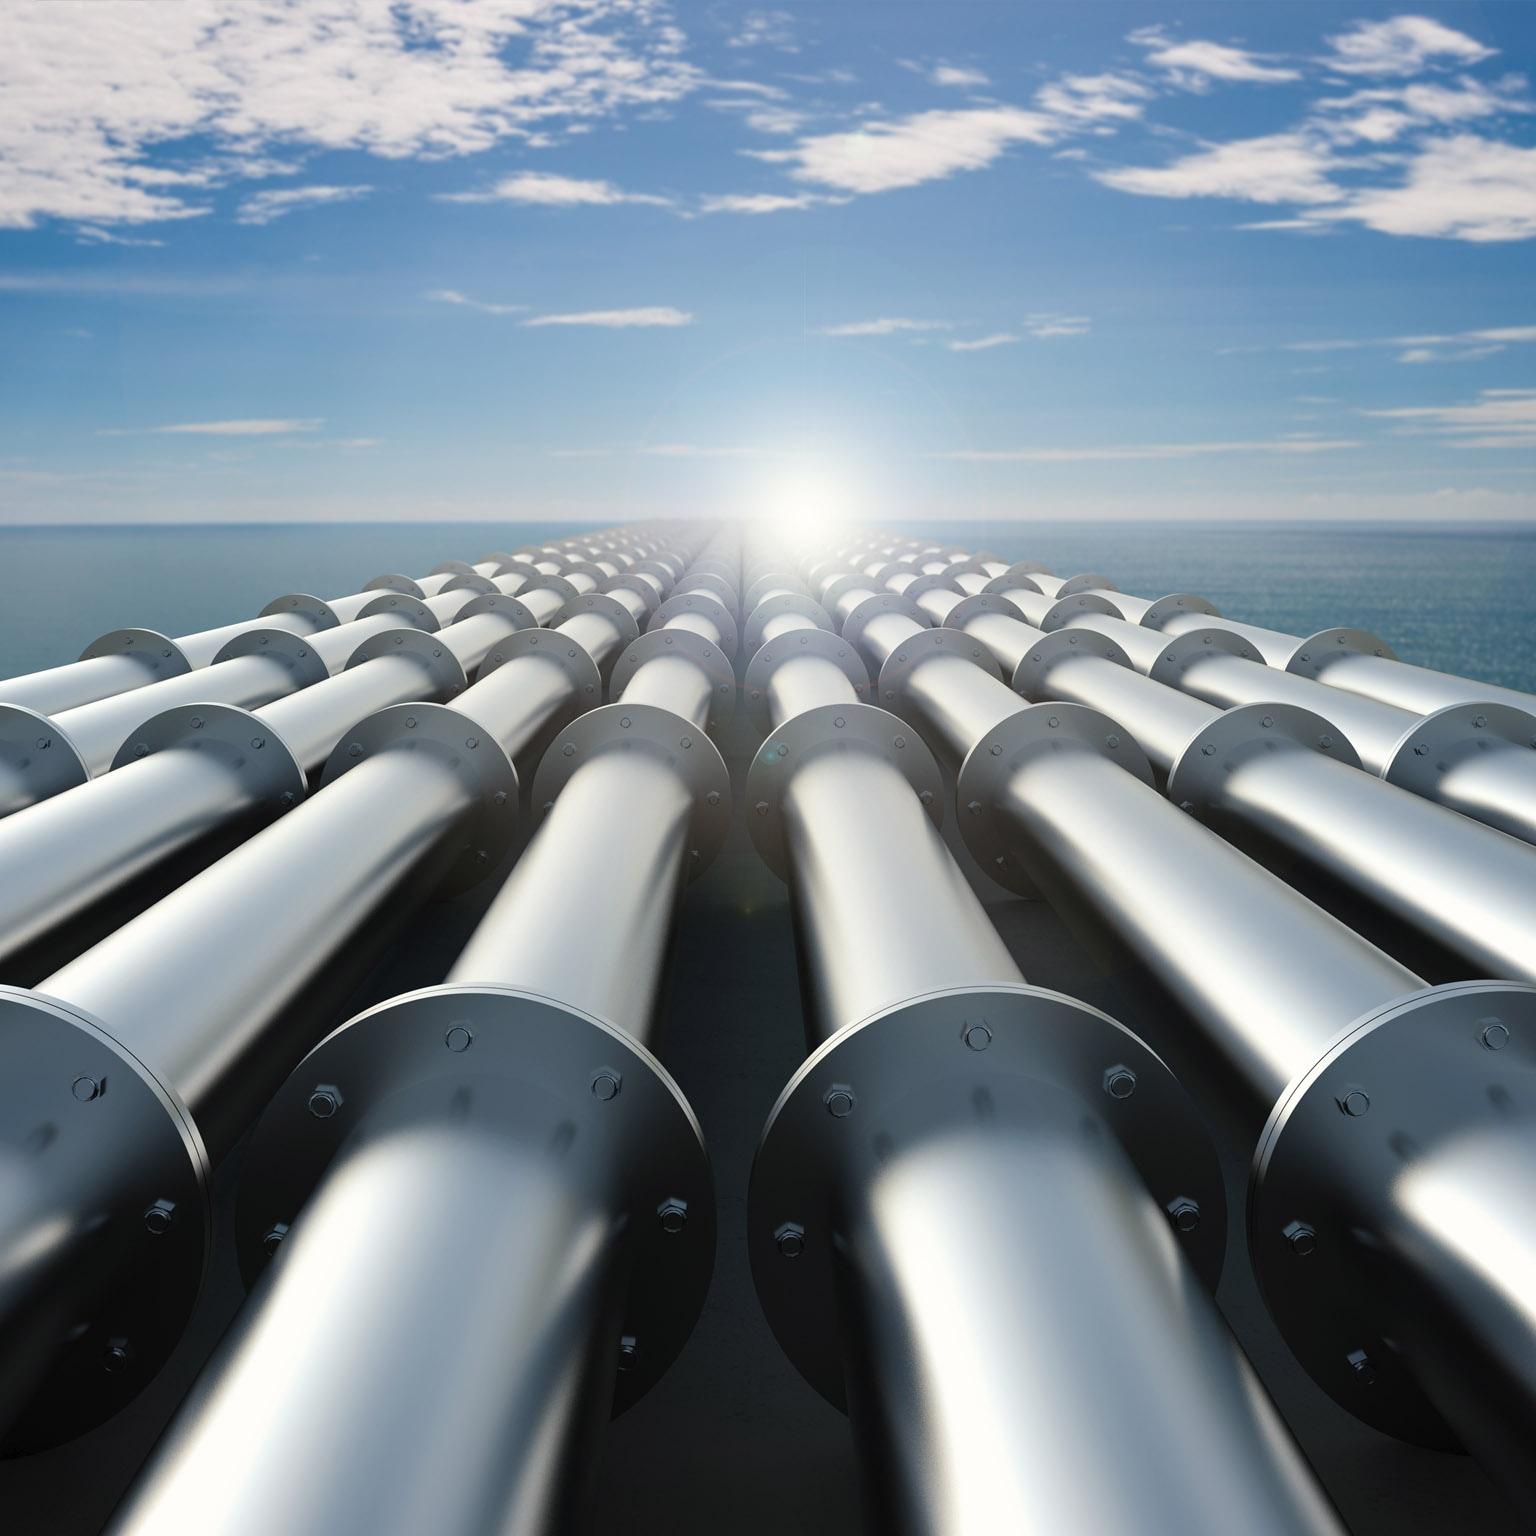 Decarbonization policies mean utilities must change | McKinsey